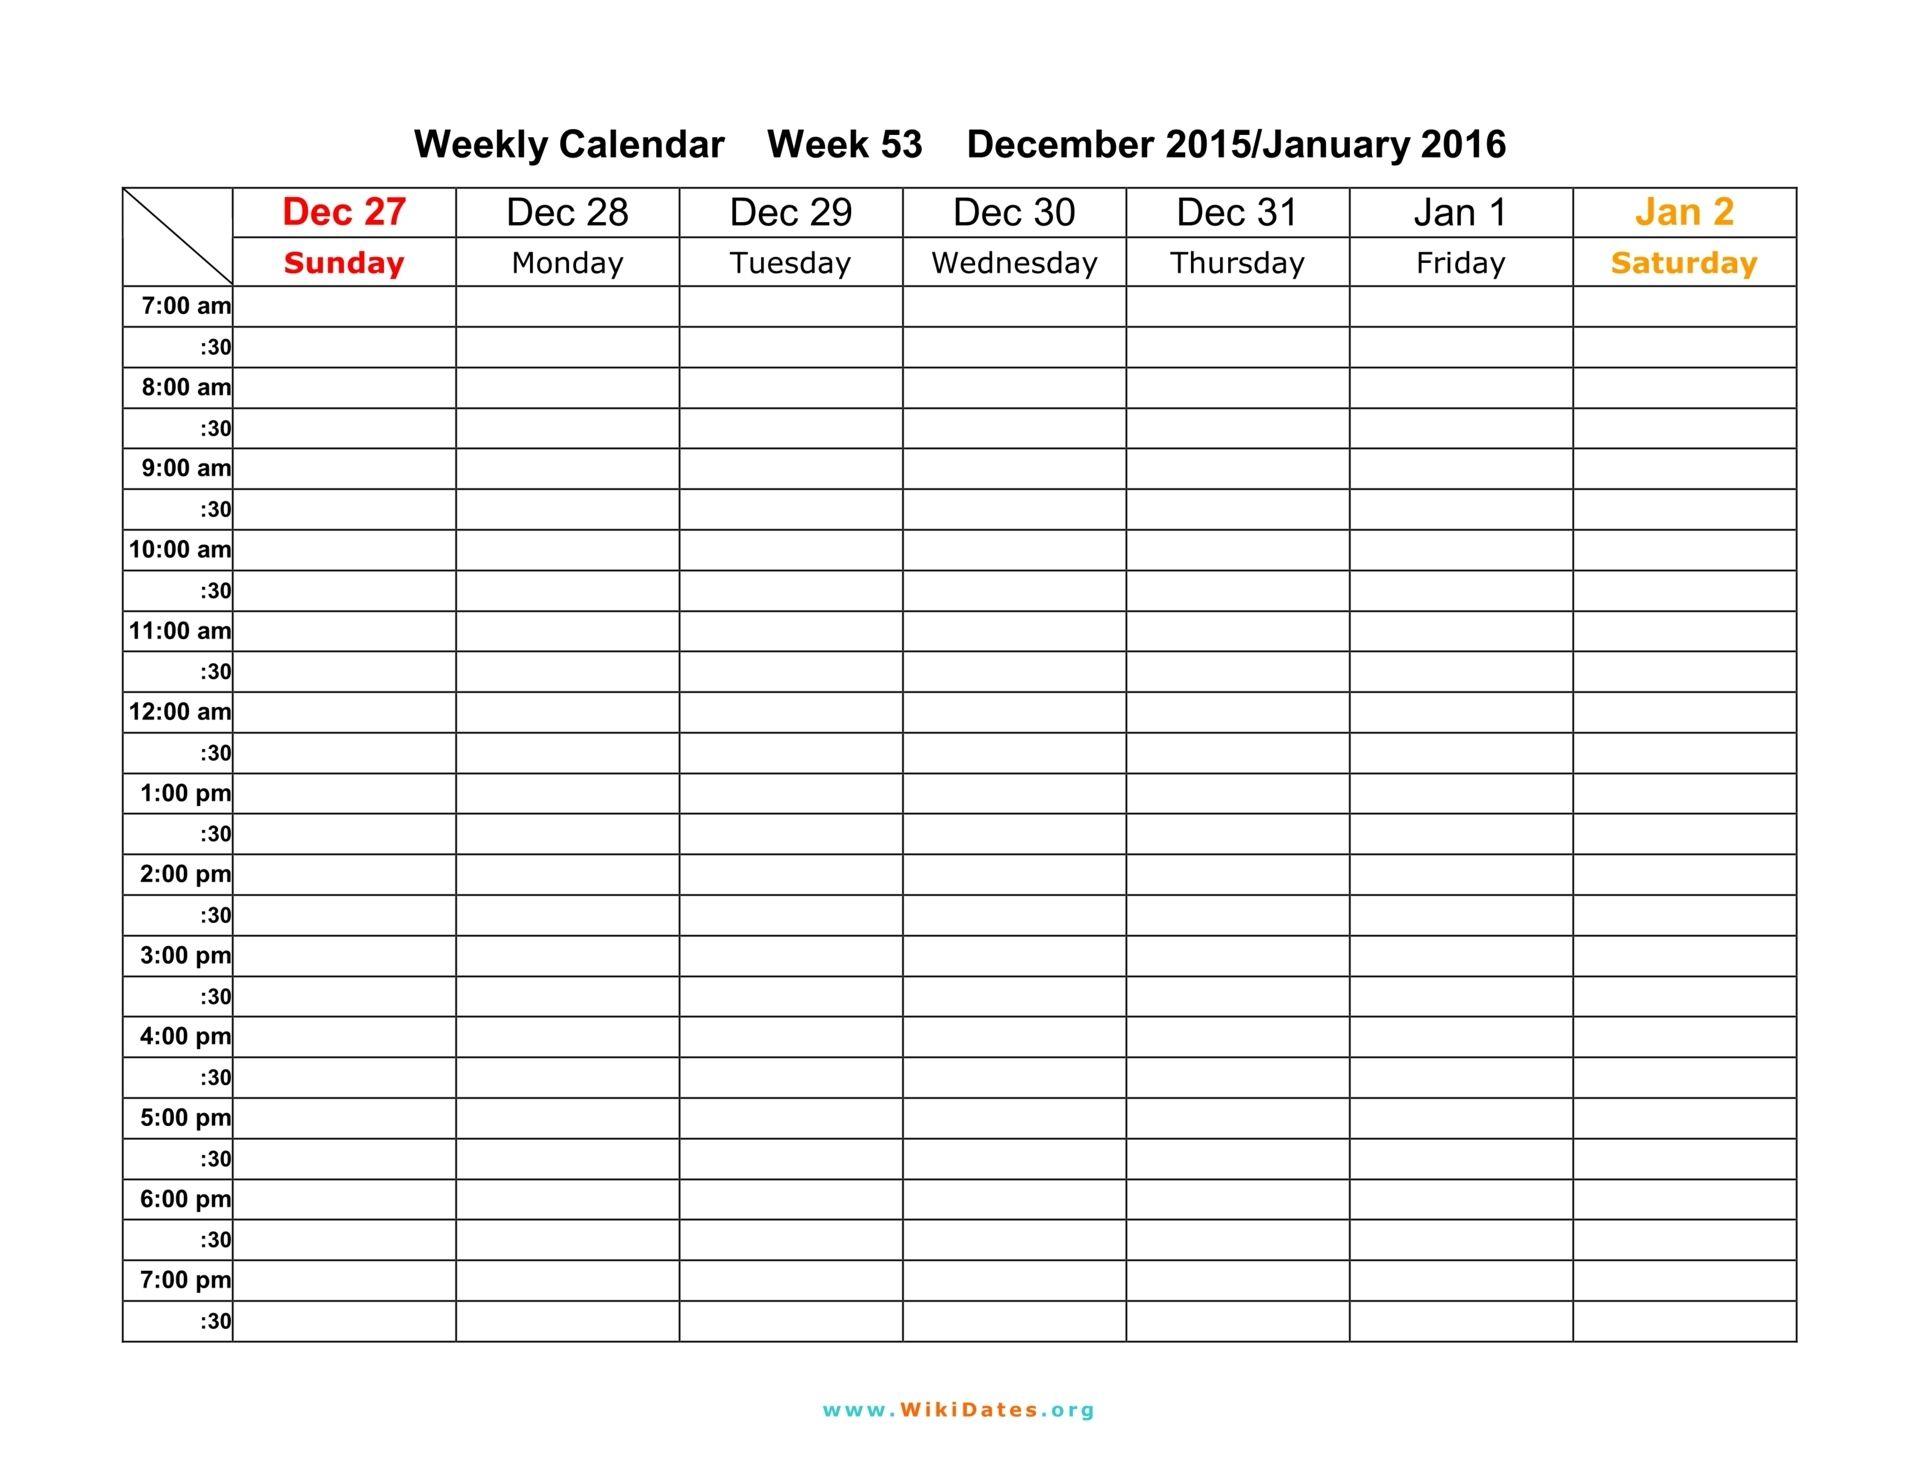 Daily Calendar Template 30 Minute Increments | Calendar